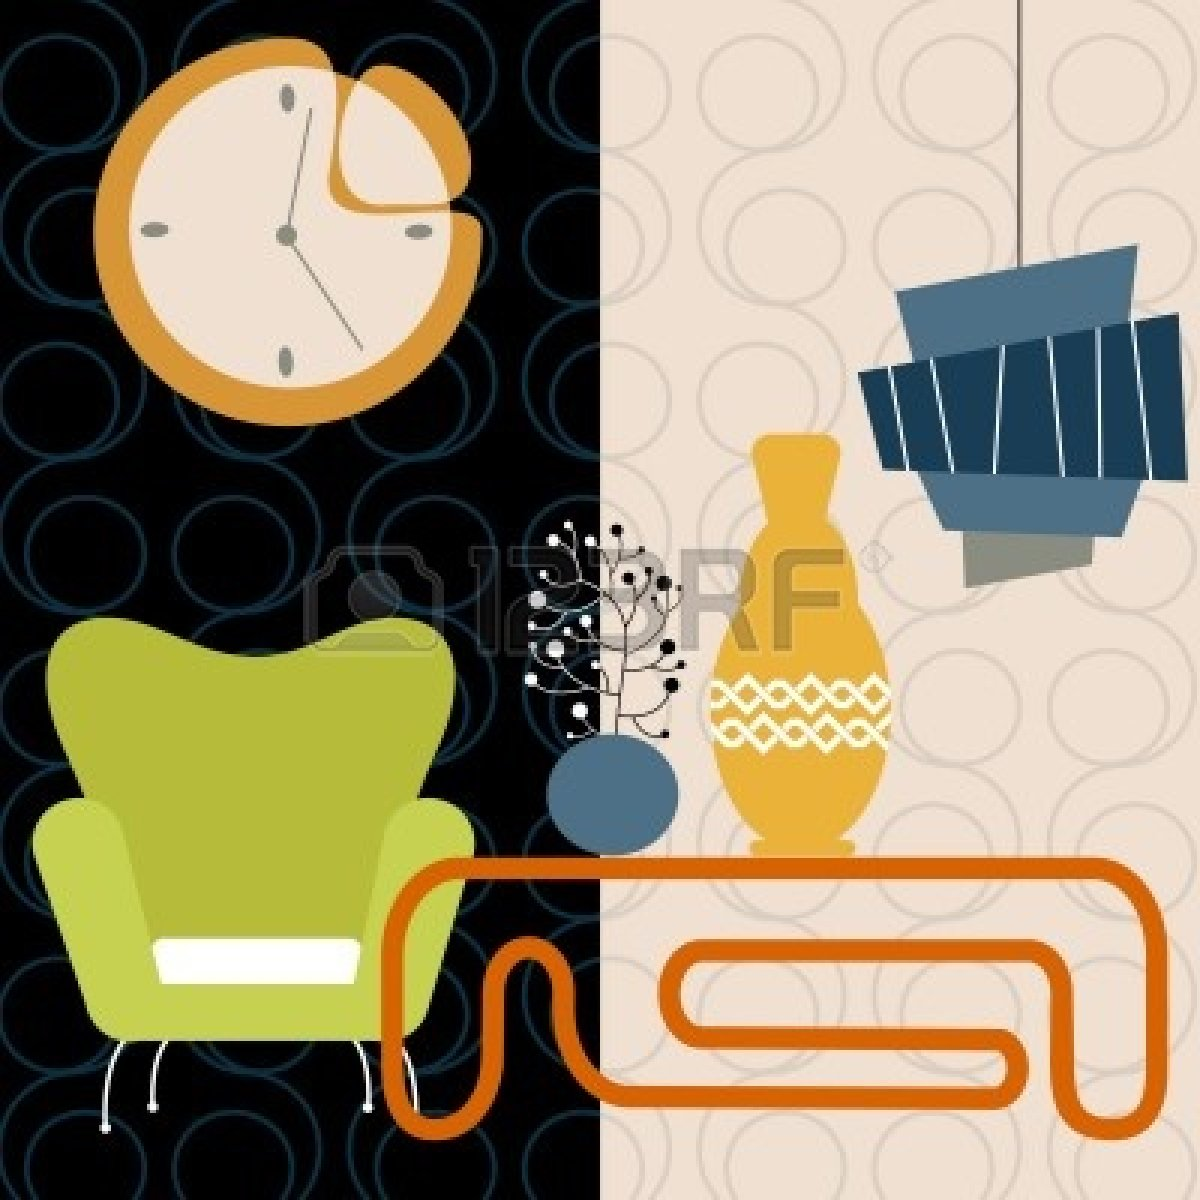 Cabinet clip art for interior designers 12 kc0ubx for Interior design video clips